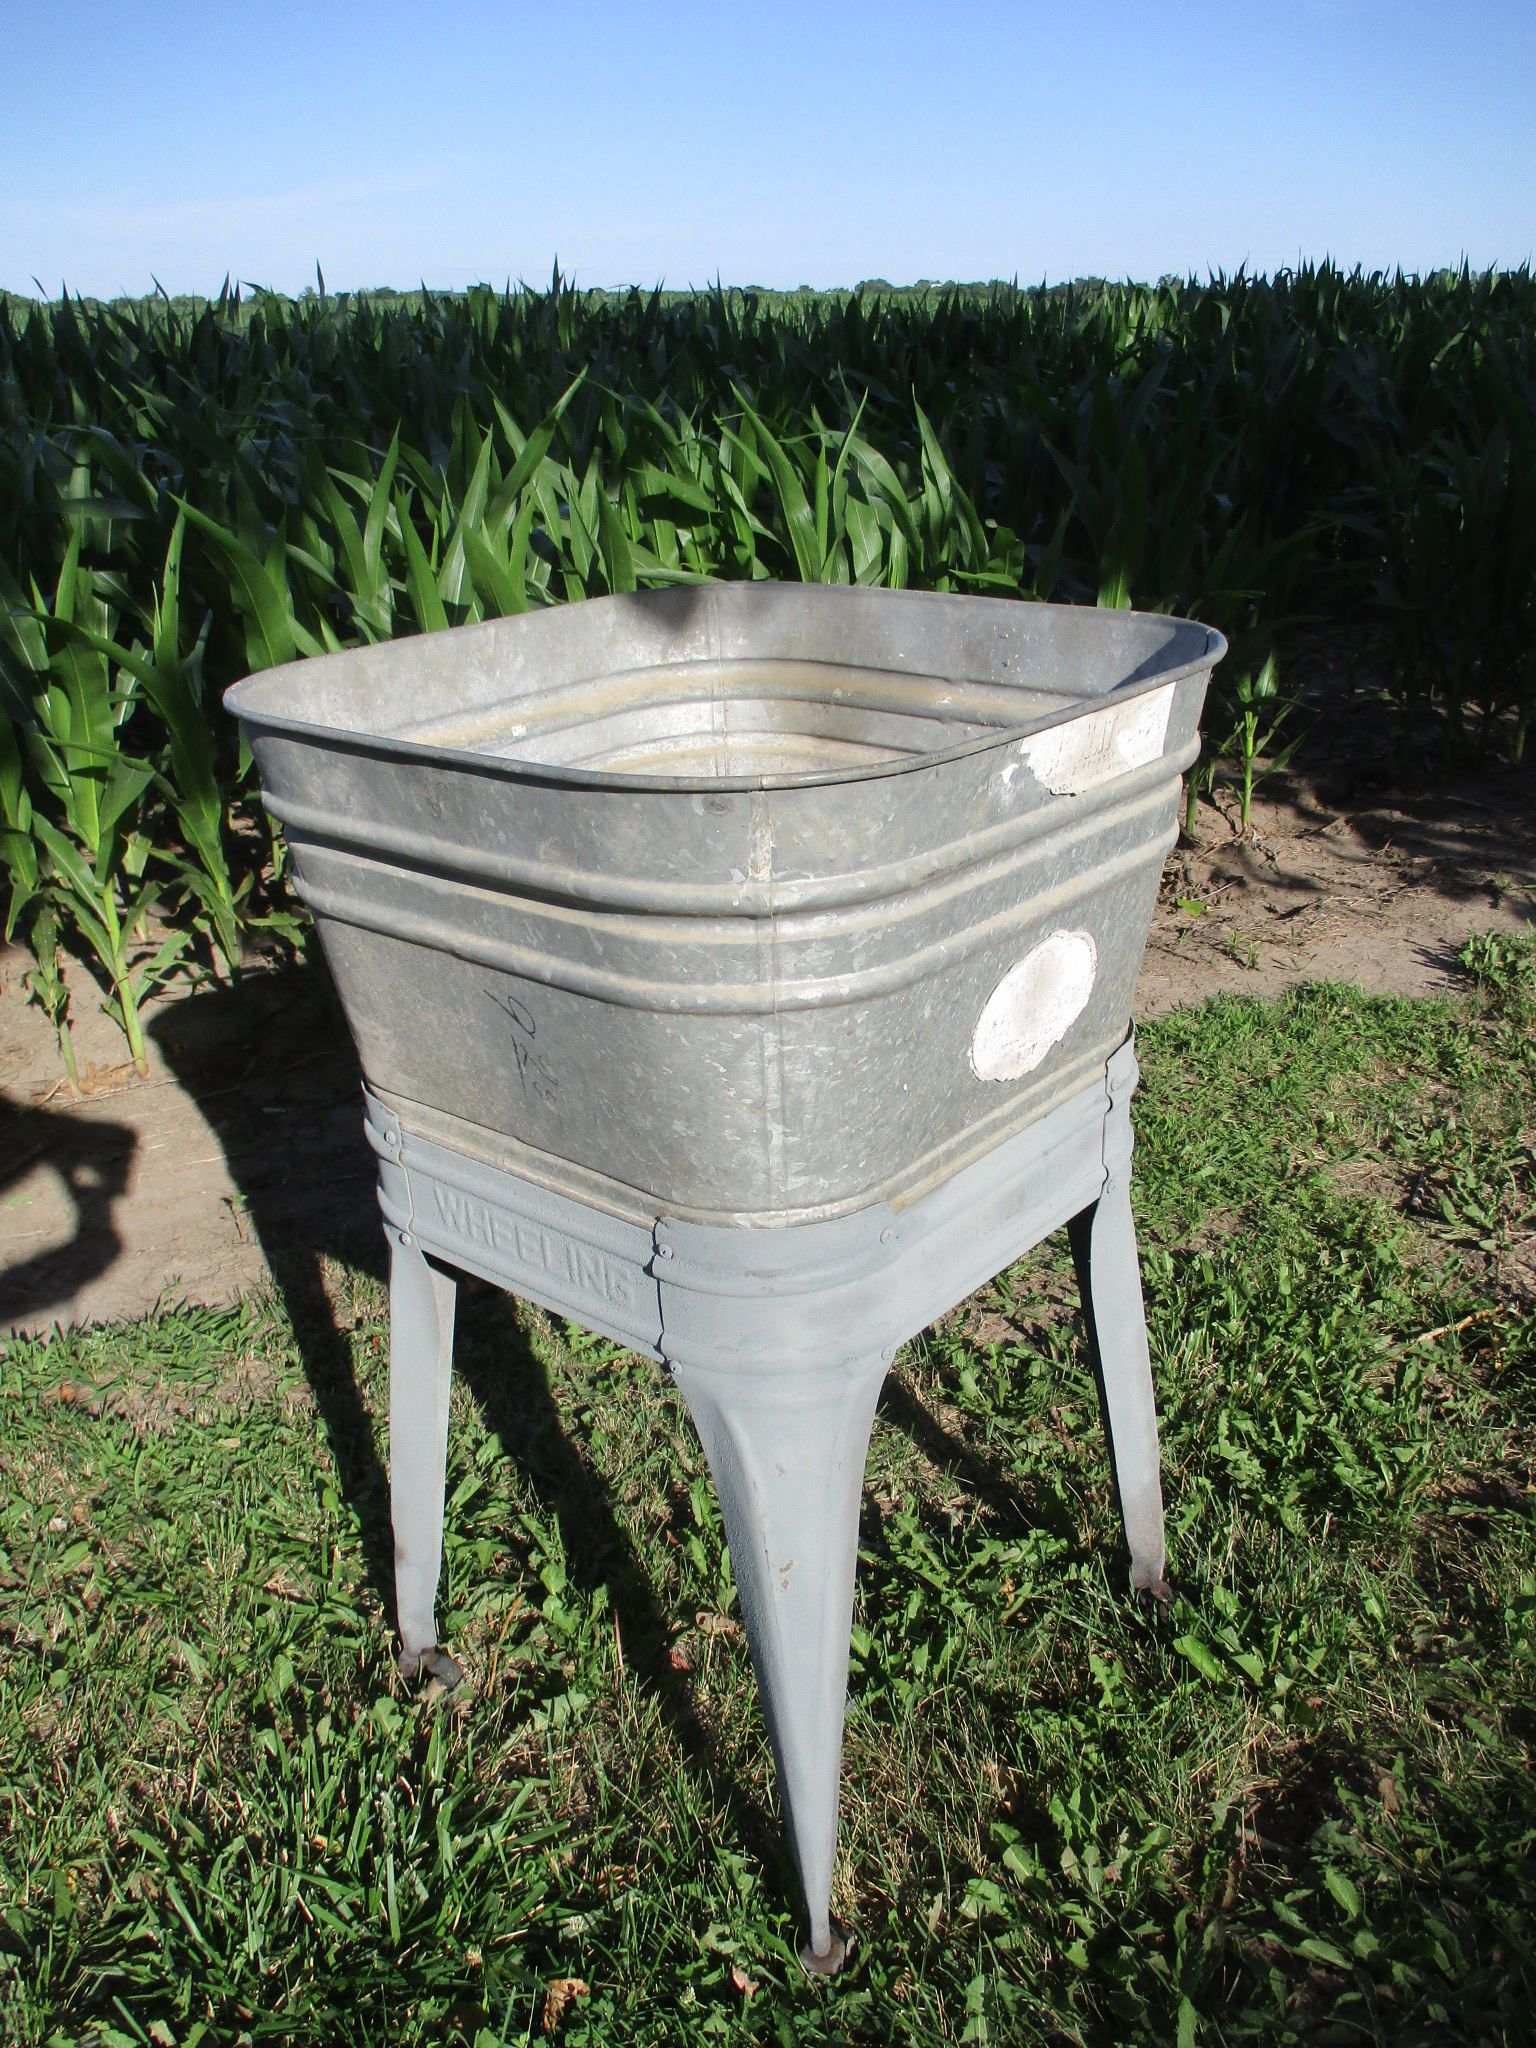 Wheeling Galvanized Single Wash Tub Beer Cooler Flower Pot Plant Stand Bucket Bz Wash Tub Stand Galvanized Wash Tubs Galvanized Wash Tub Galvanized Tub Sink